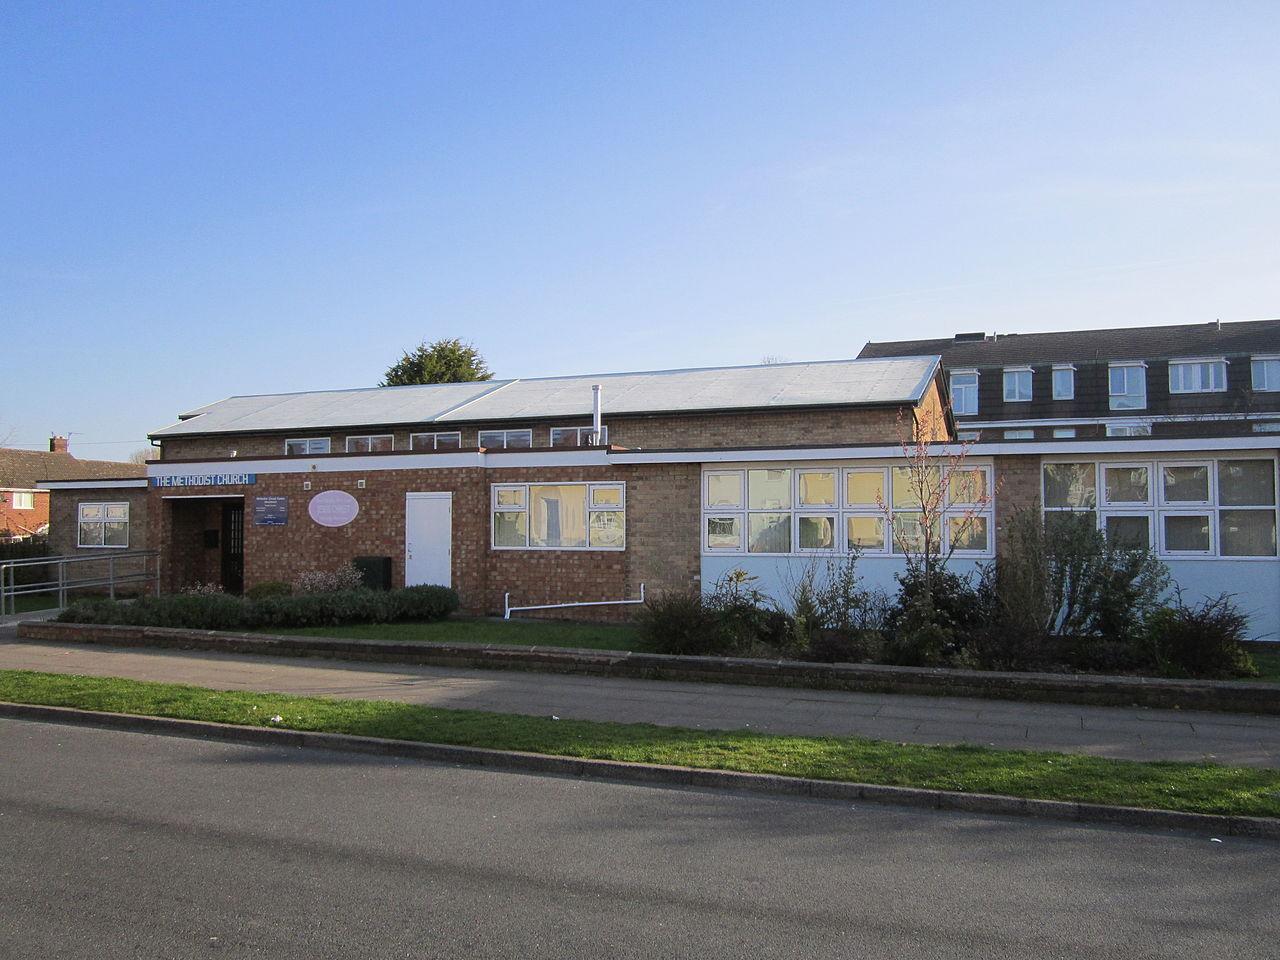 File:Methodist Church Centre. Woodchurch. Wirral.jpg - Wikimedia Commons